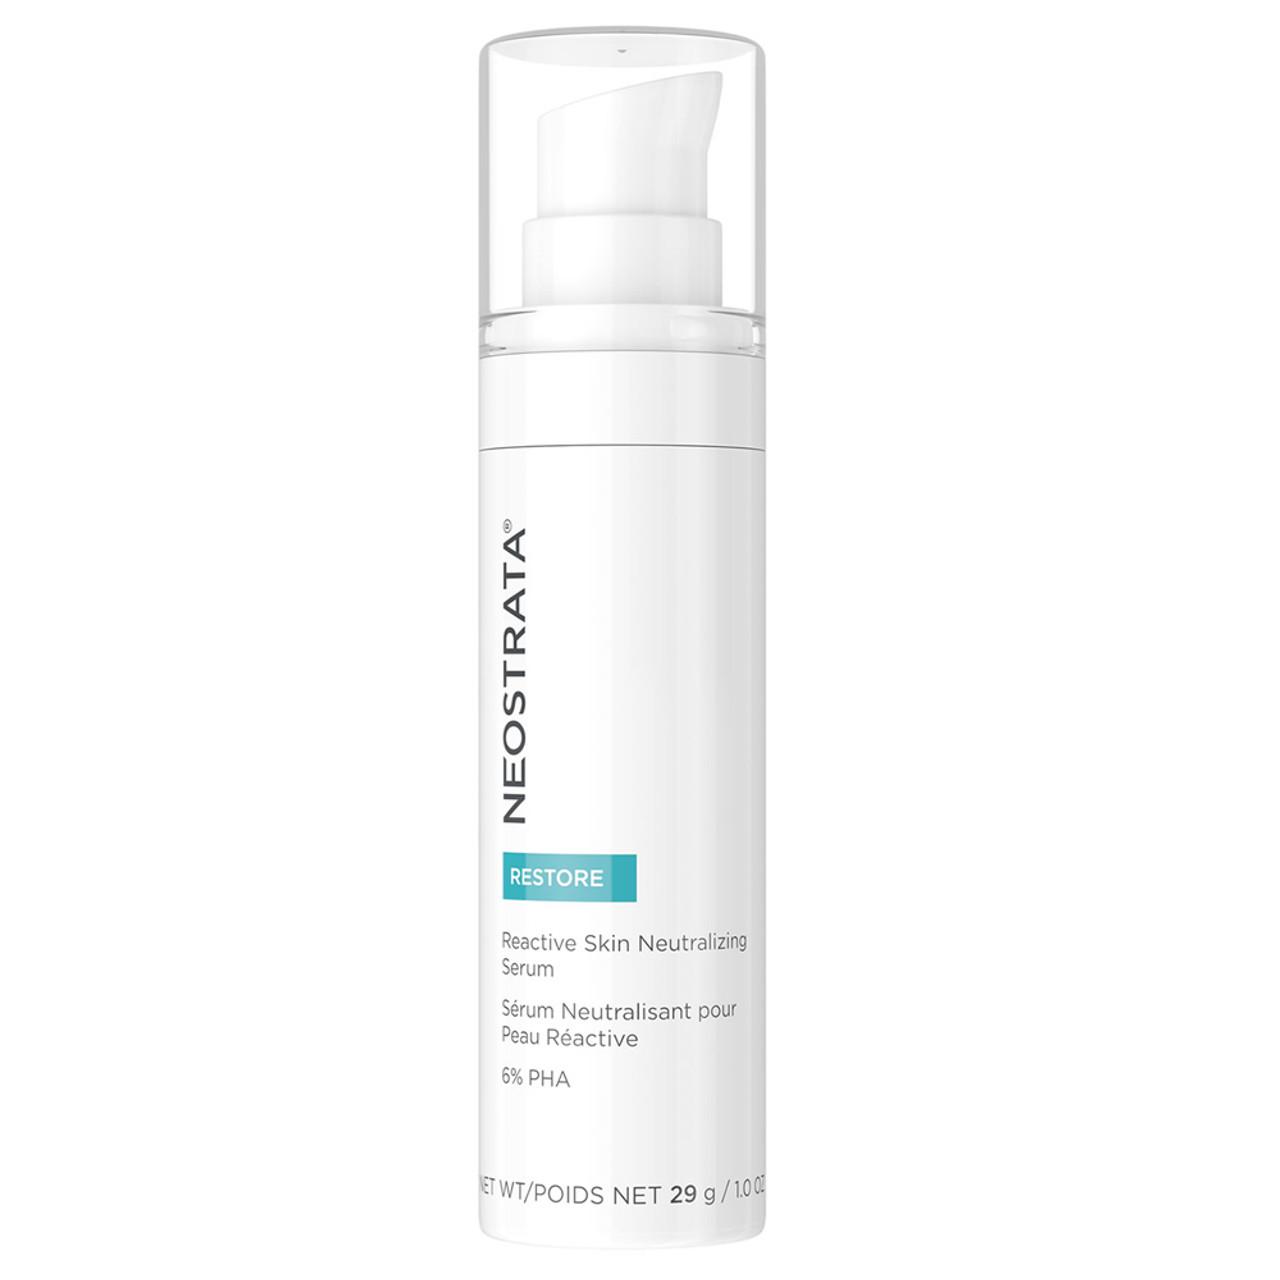 NeoStrata Reactive Skin Neutralizing Serum BeautifiedYou.com